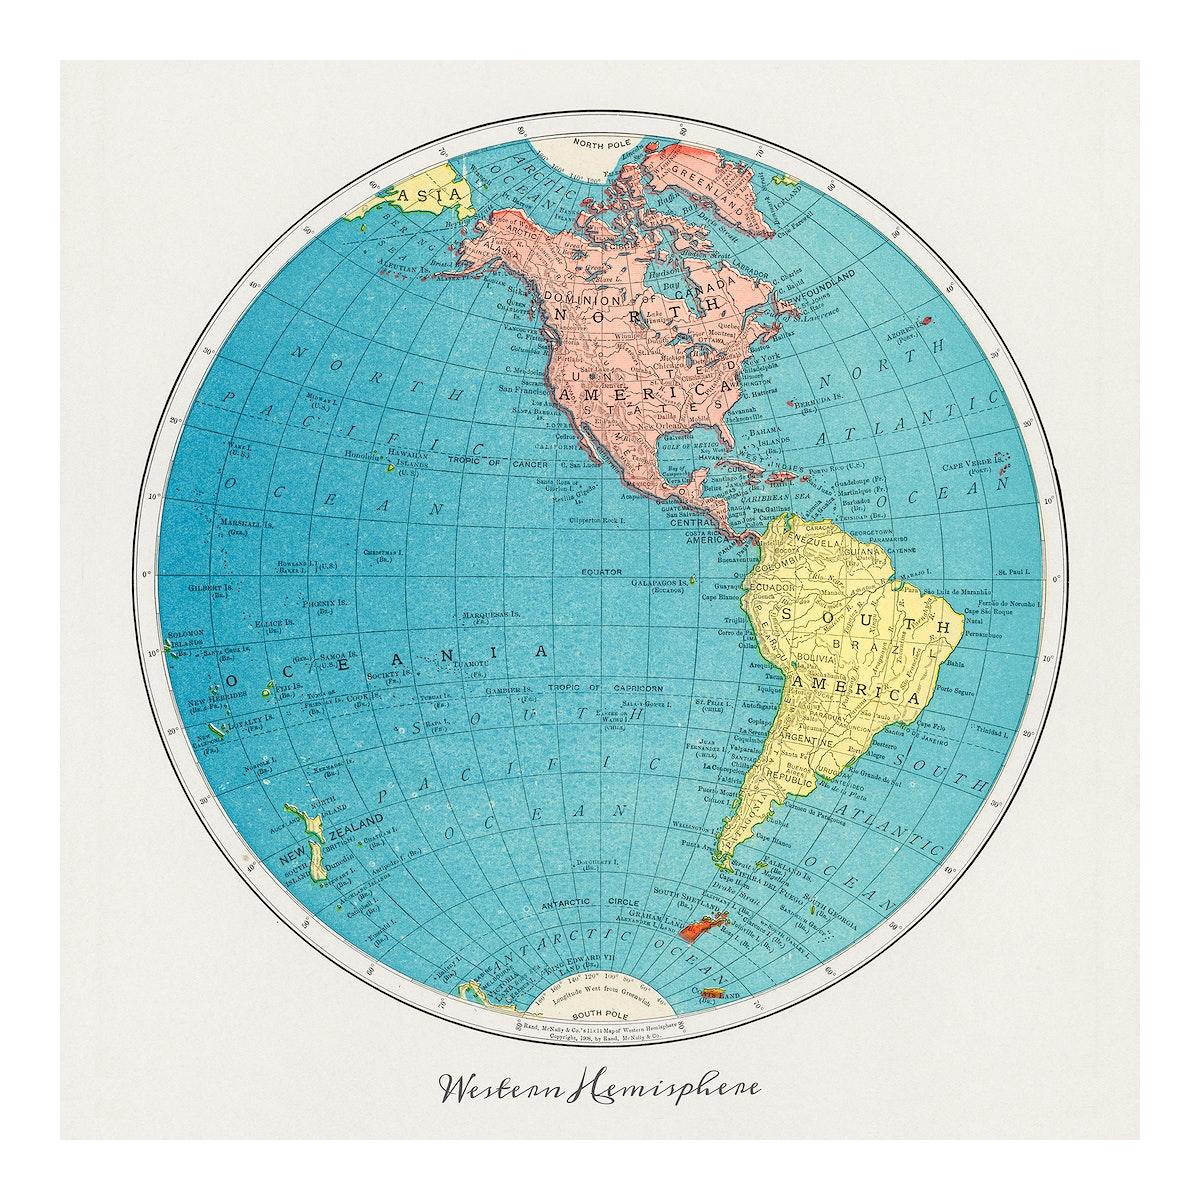 Western Hemisphere map vintage illustration wall art print and poster design remix from original artwork.